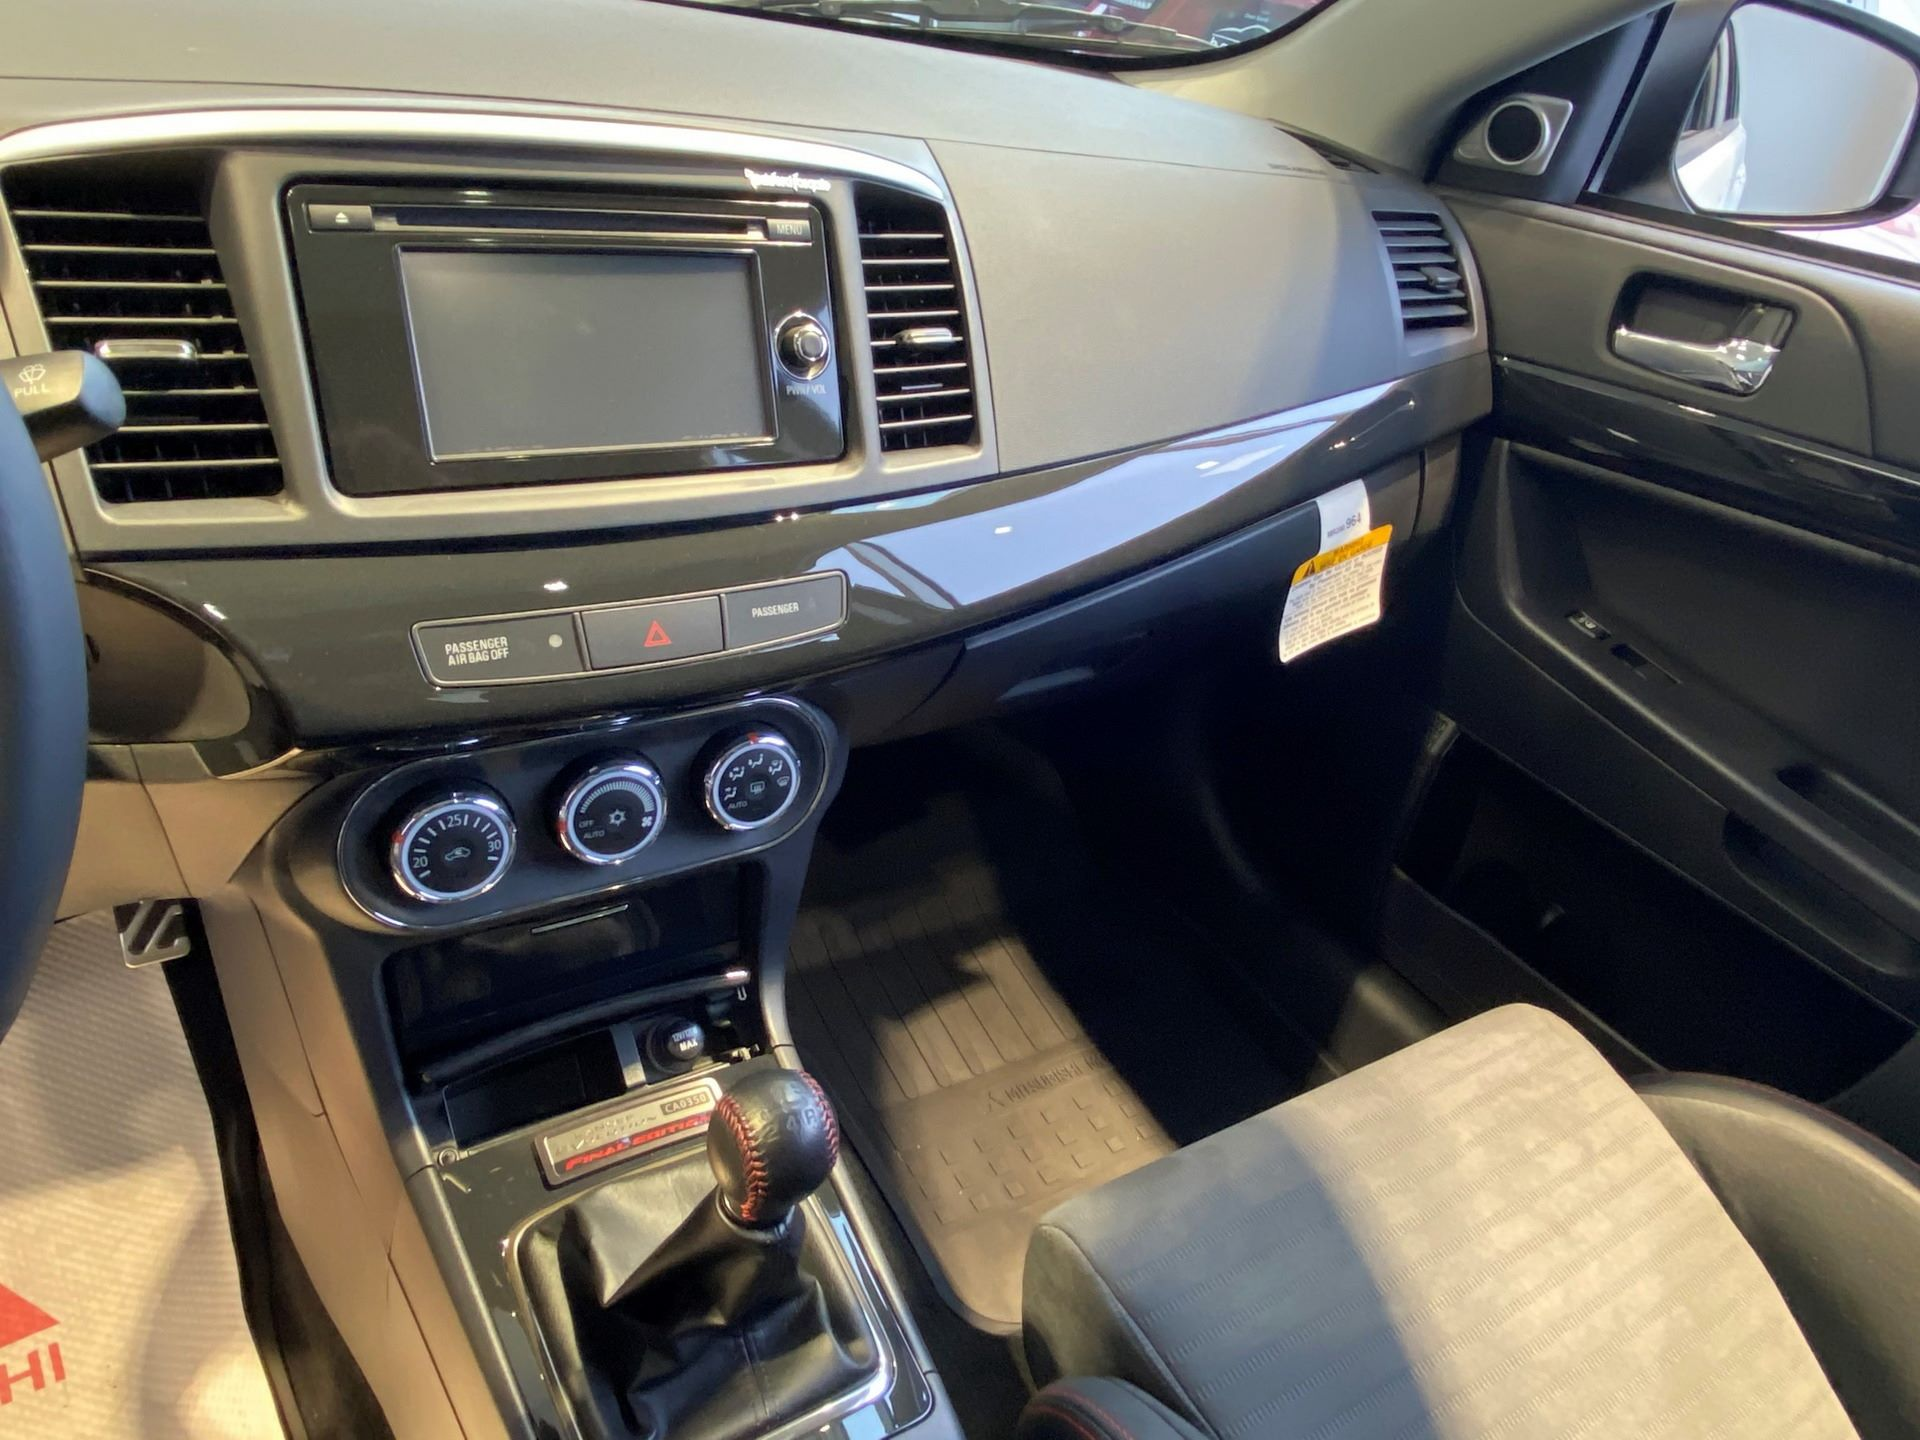 Mitsubishi-Lancer-Evo-Final-Edition-for-sale-17